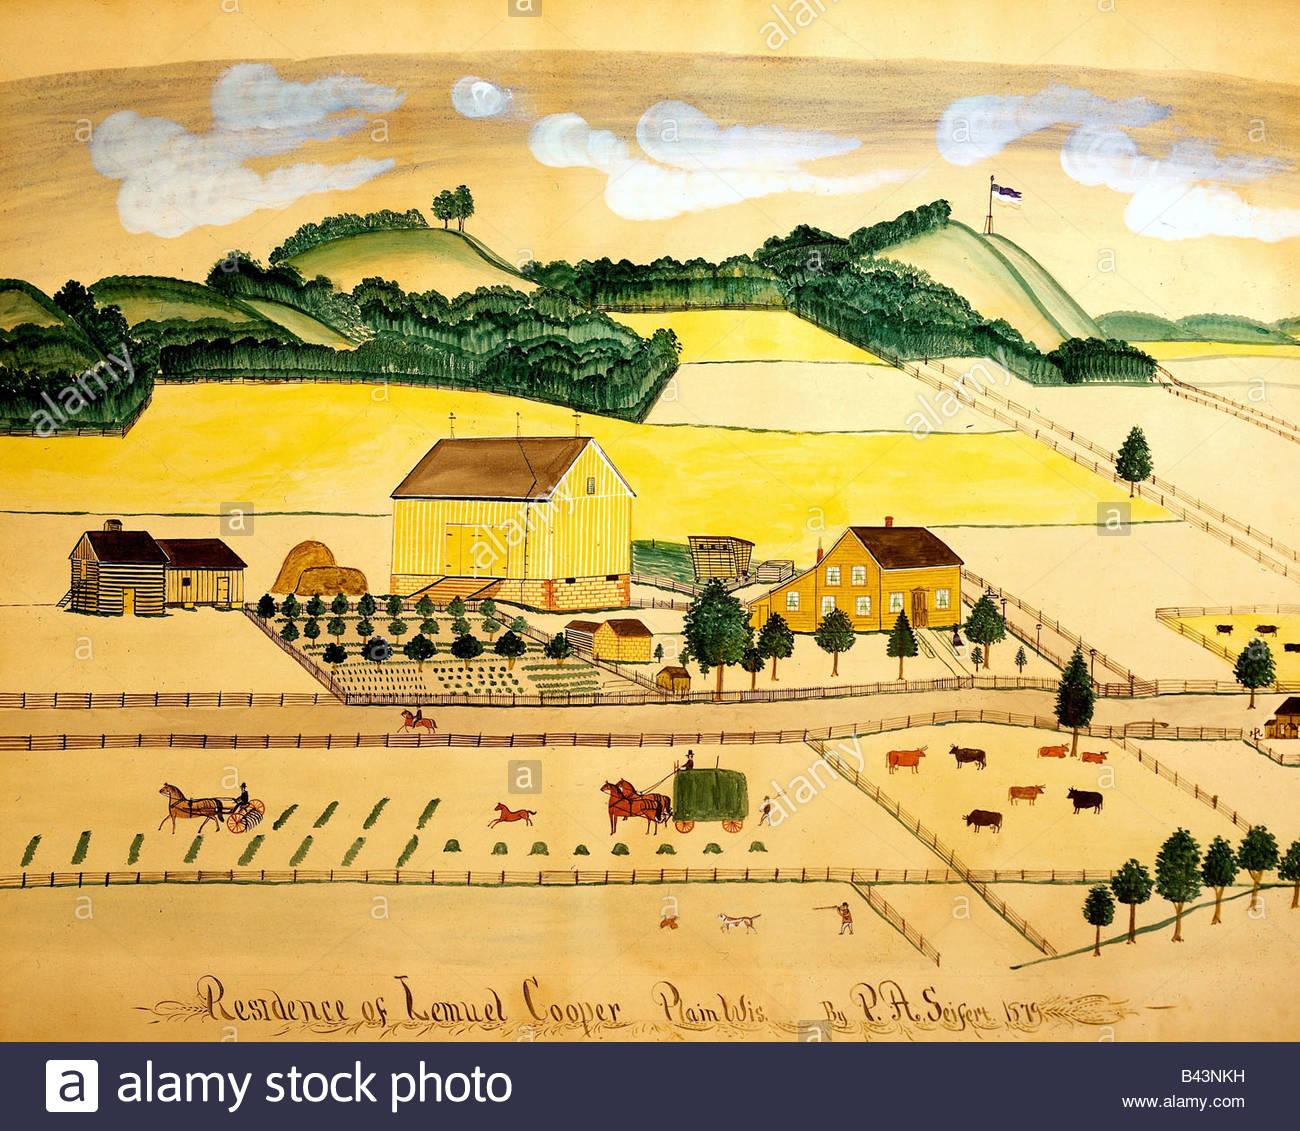 "Beaux-arts - Seifert, Paul A. (1840 - 1921), peinture, 'Résidence de Samuel Cooper, Plaine, Wisconsin"", Photo Stock"